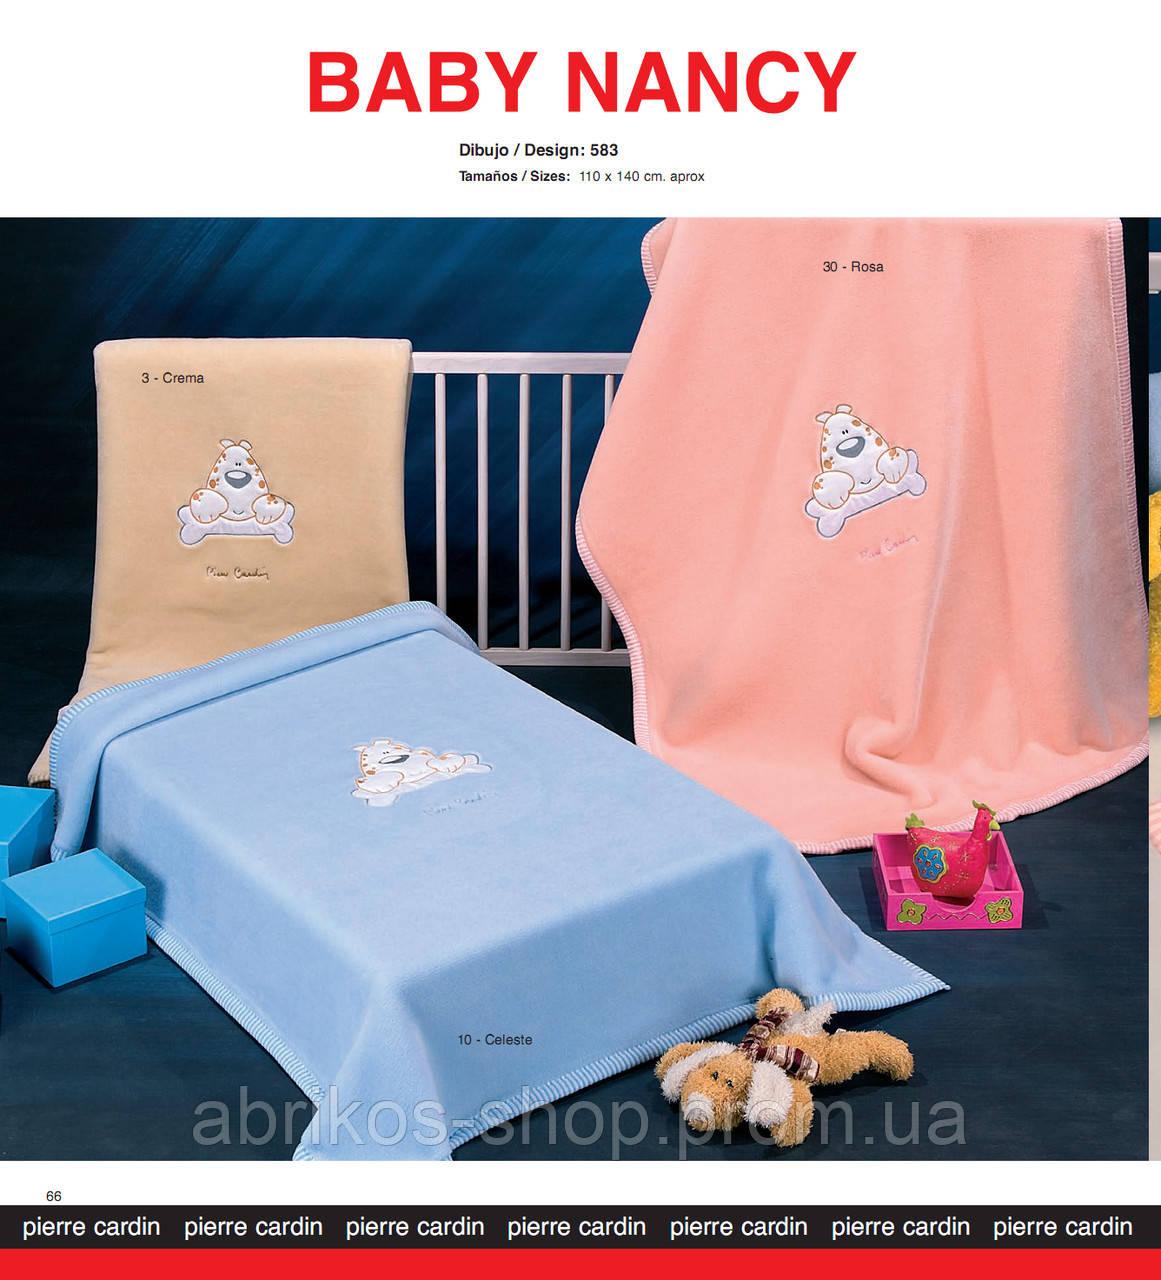 Детское одеяло - плед  Вaby Nancy   ( Испания )